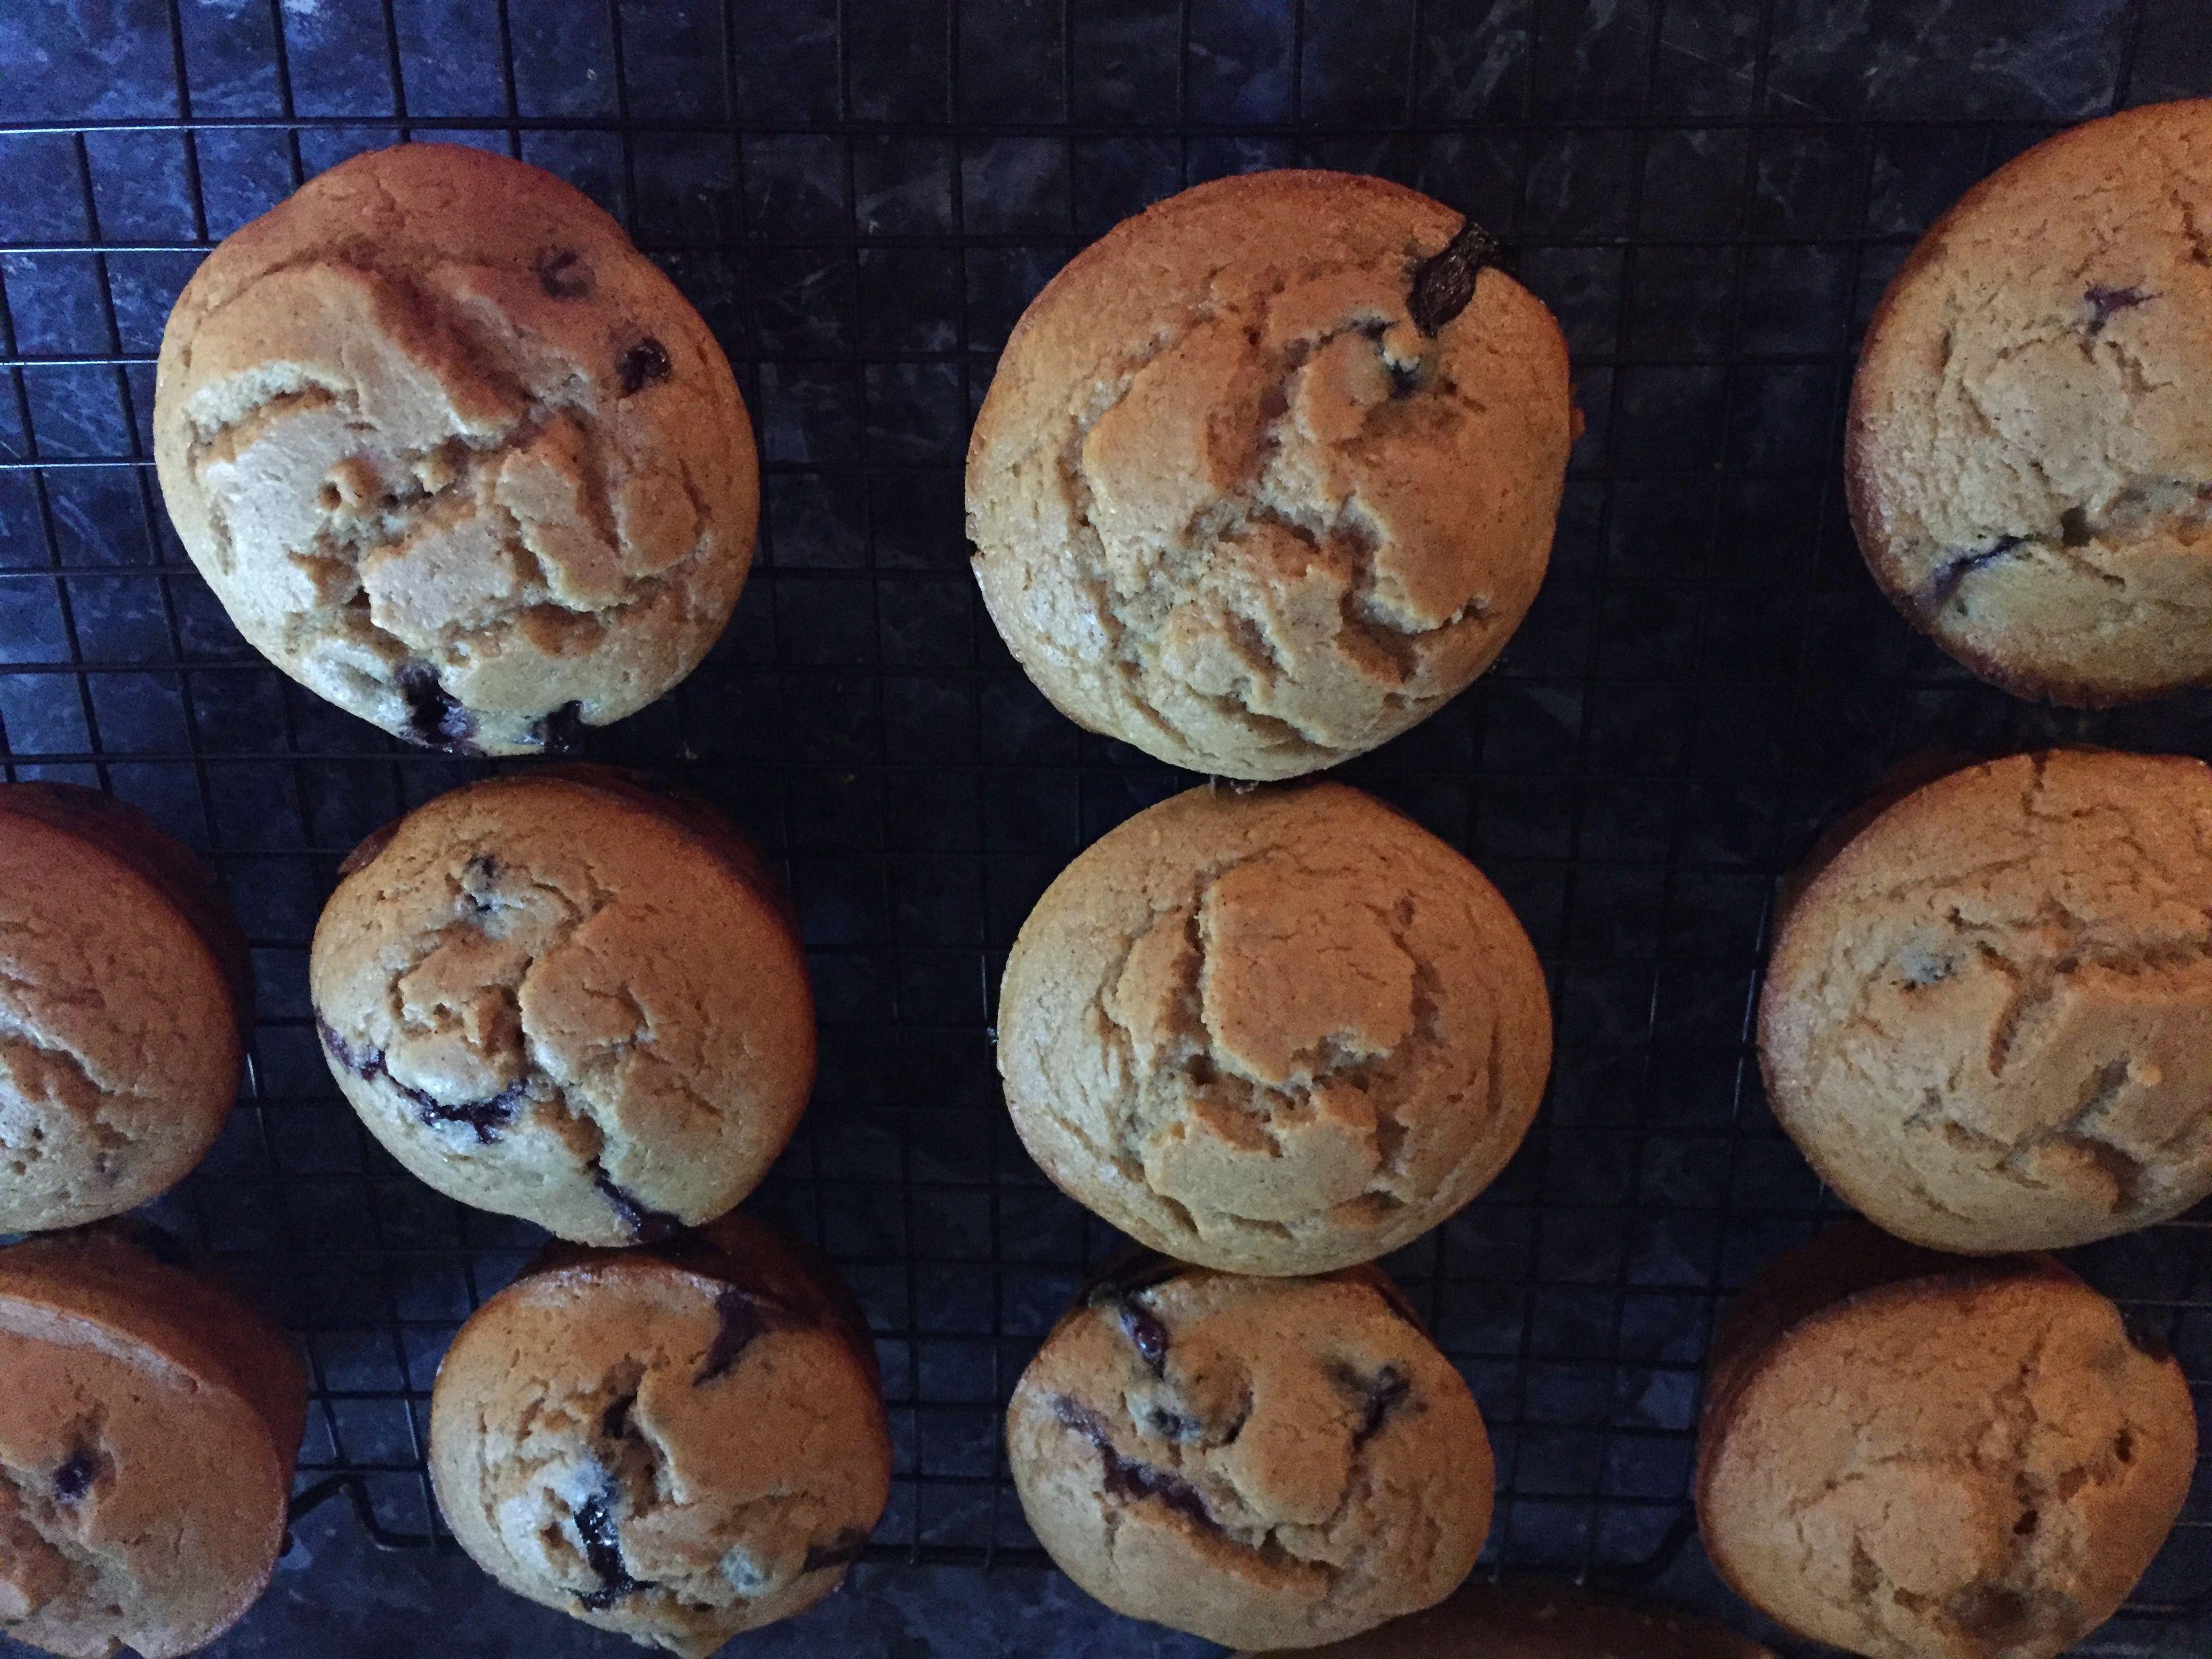 Blueberry protein muffins 2 cups kodiak cake mix 1 scoop